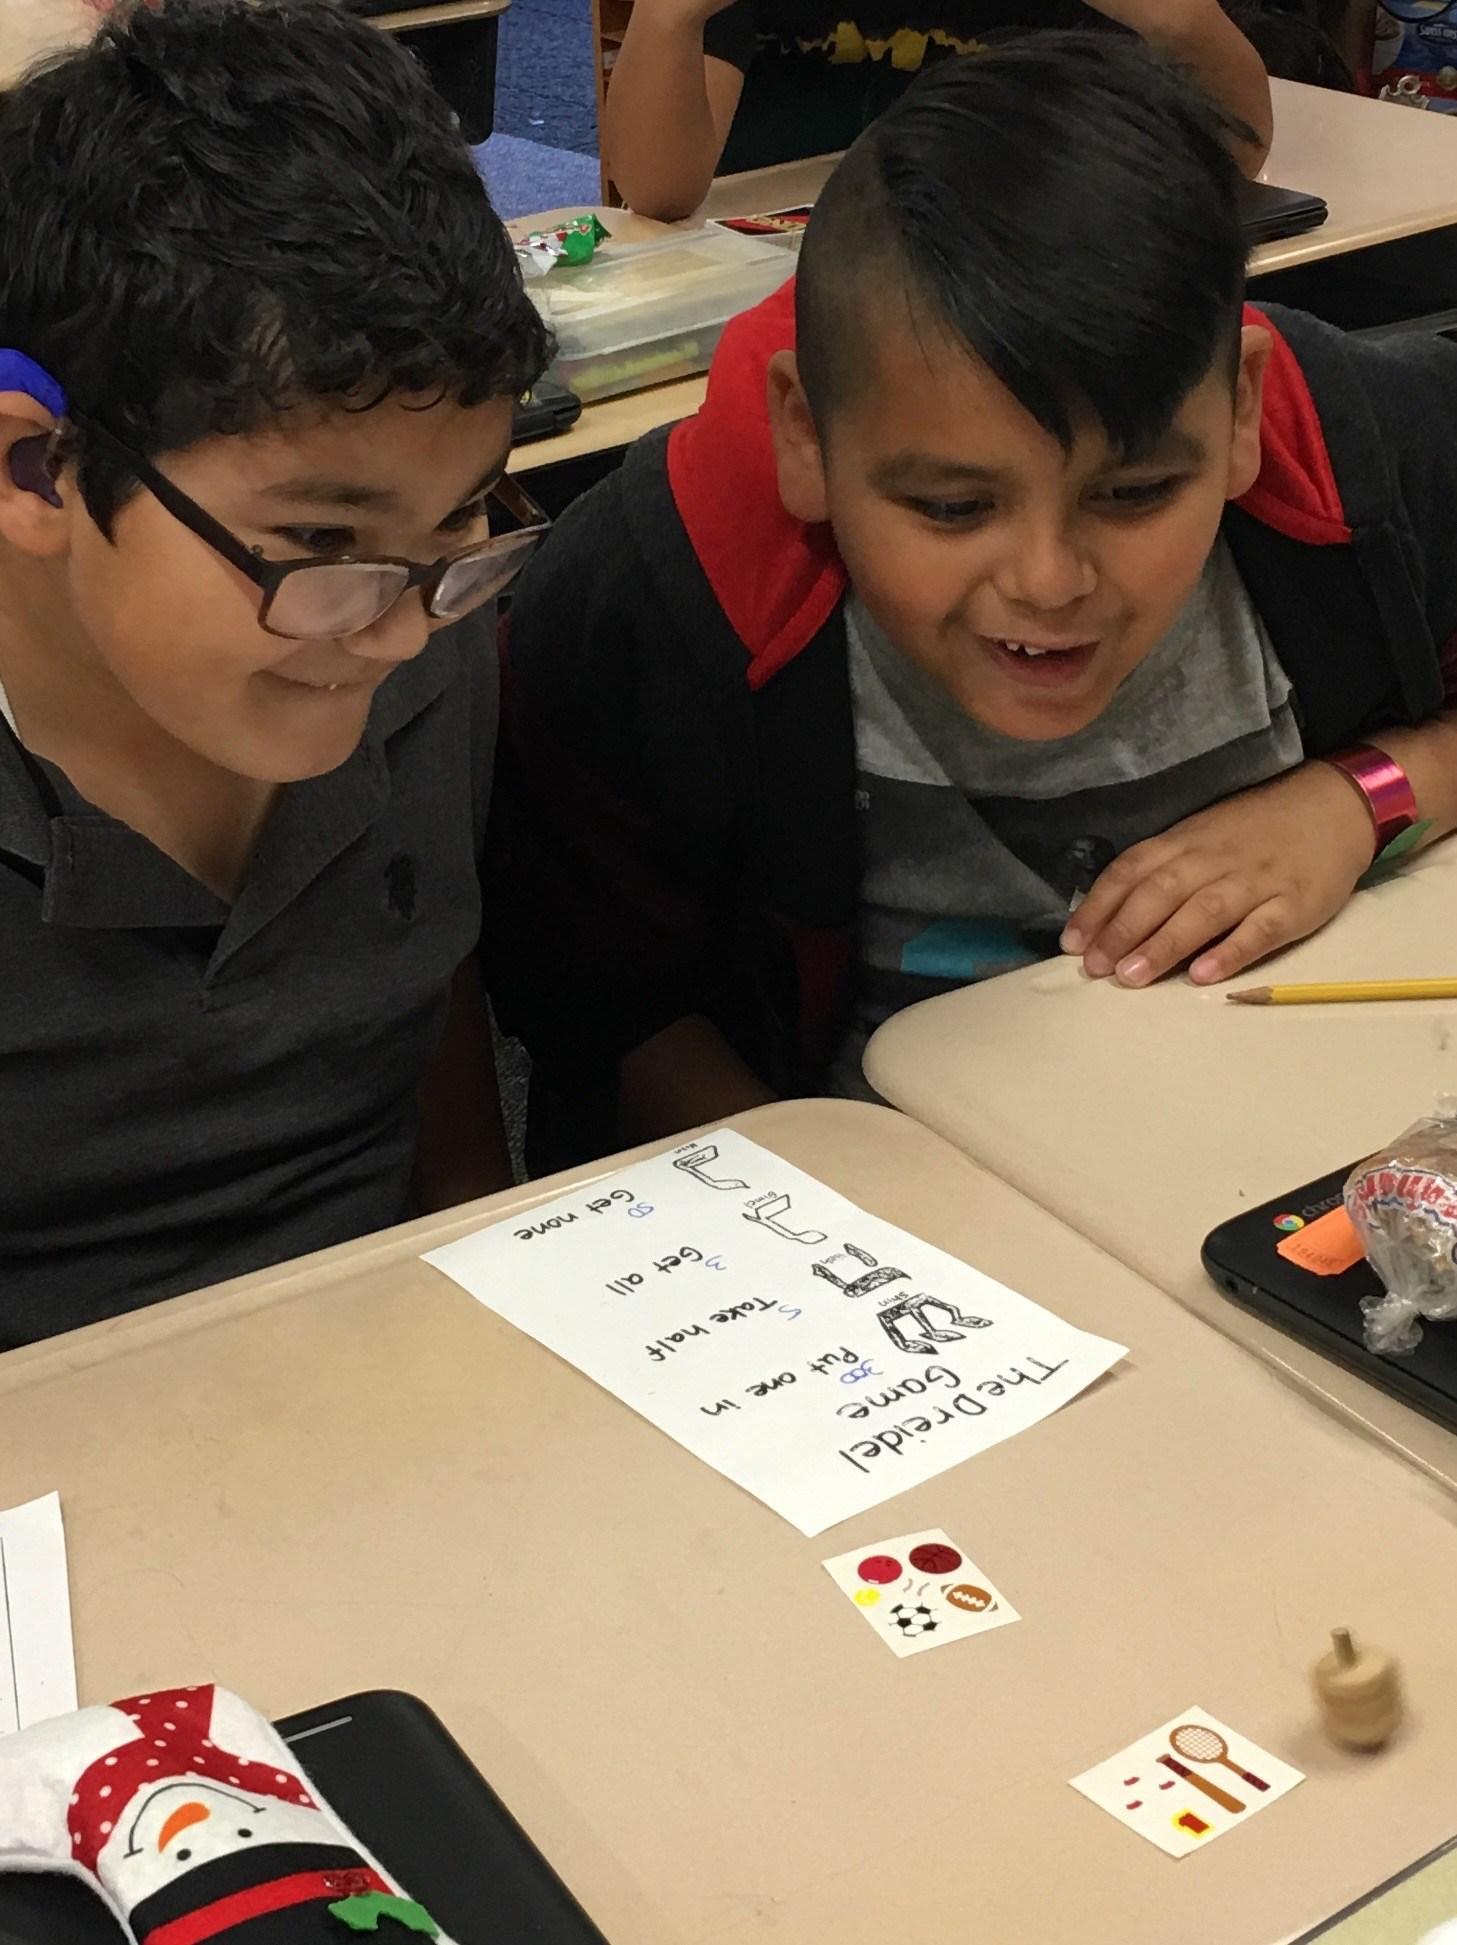 Dreidel Game for Math Activity